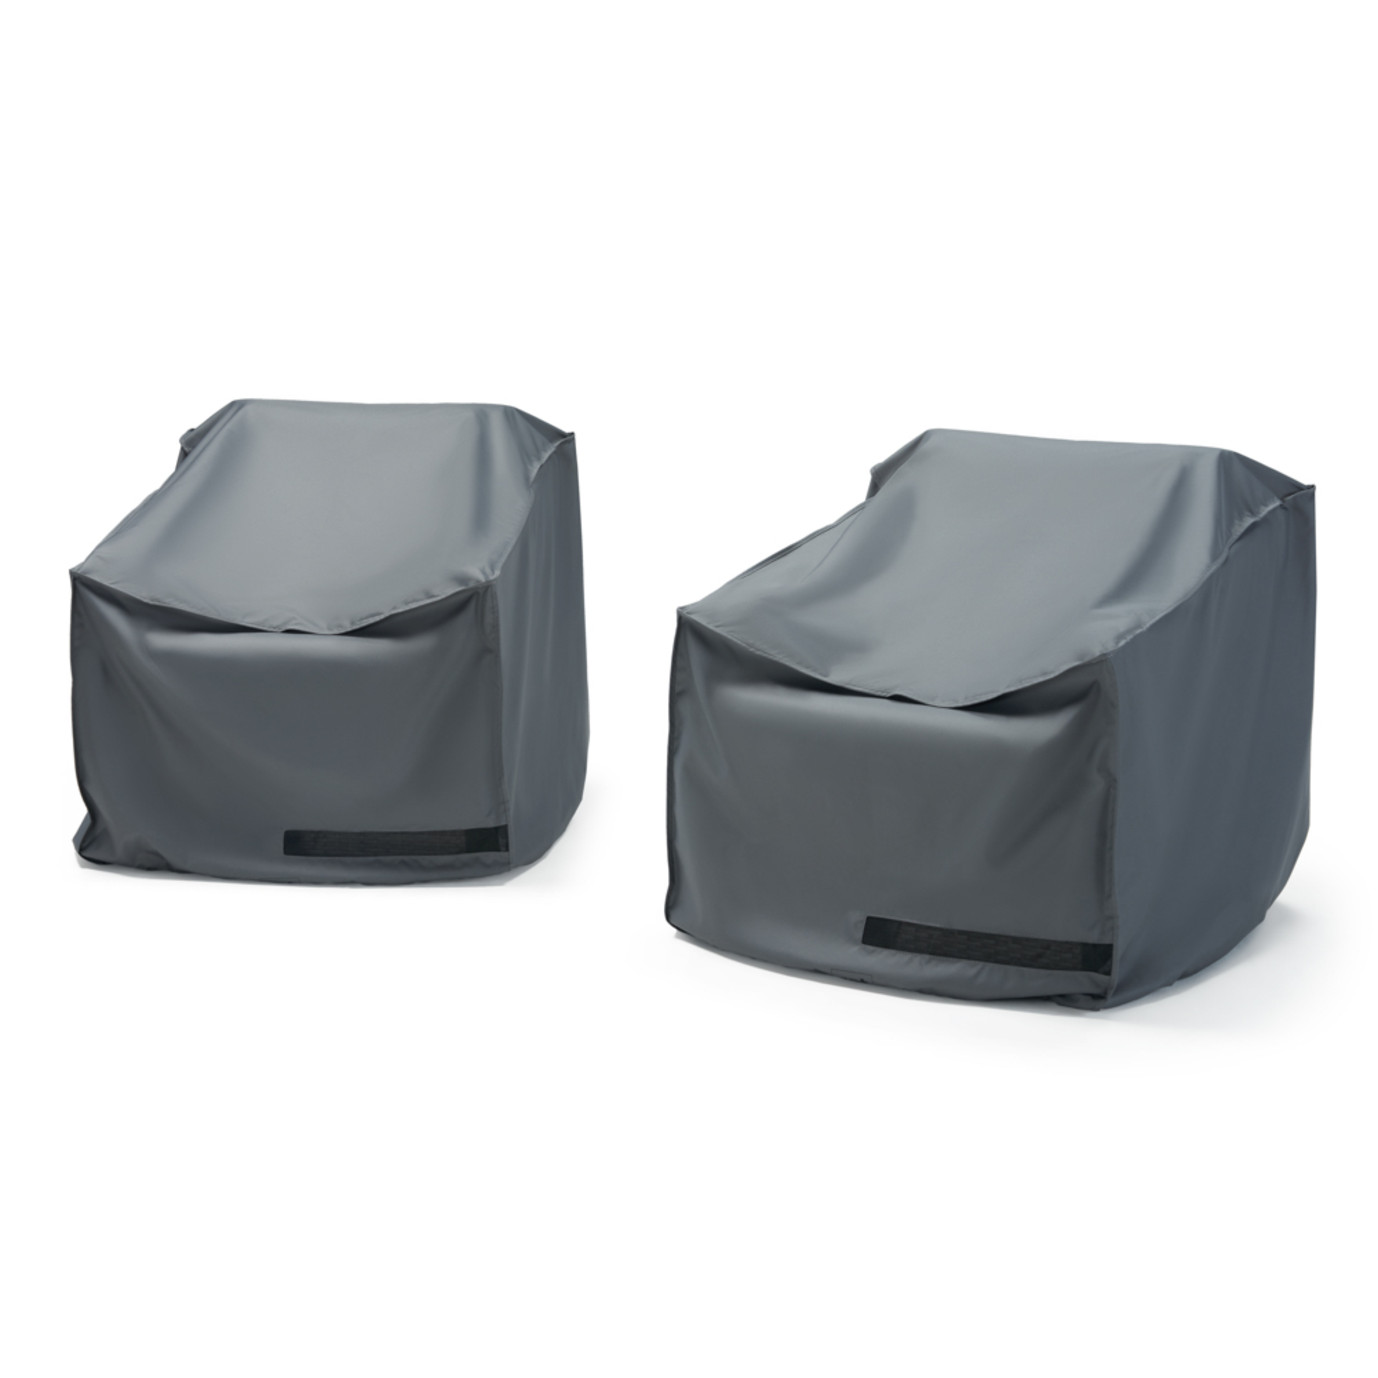 Portofino® Casual 2 Piece Club Chair Furniture Cover Set